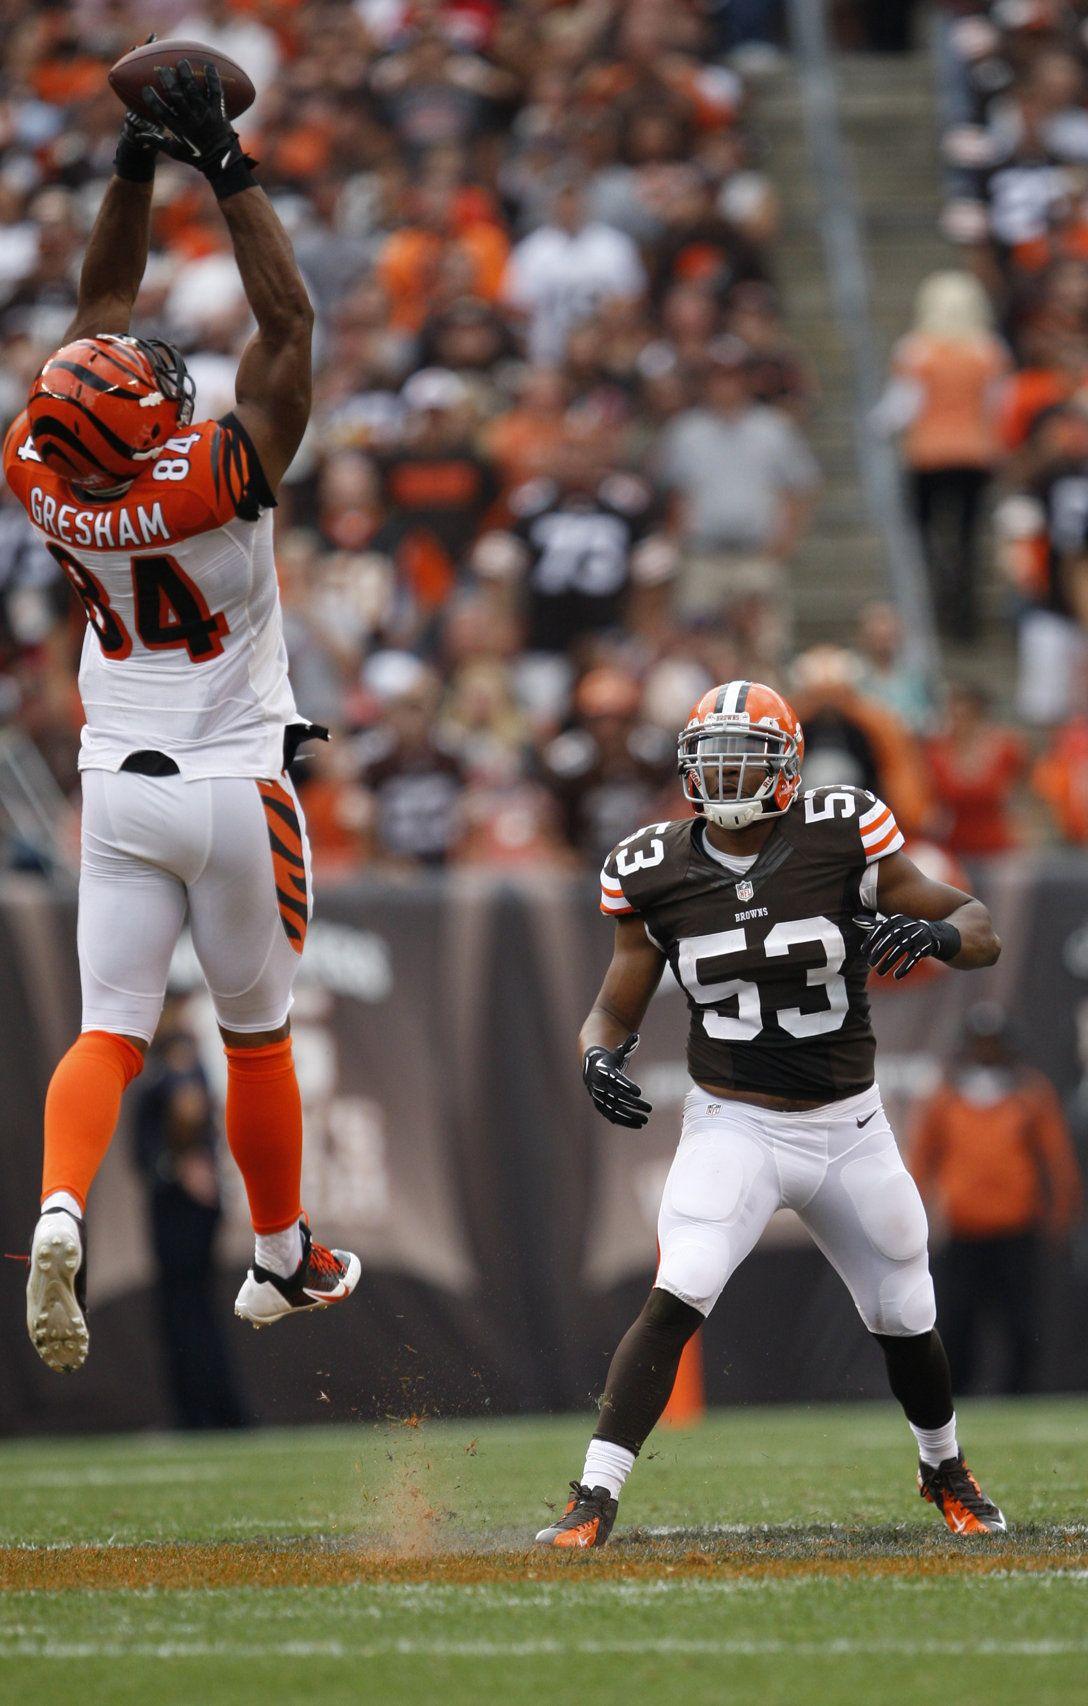 NFL Cincinnati Bengals at Cleveland Browns Nfl week 4